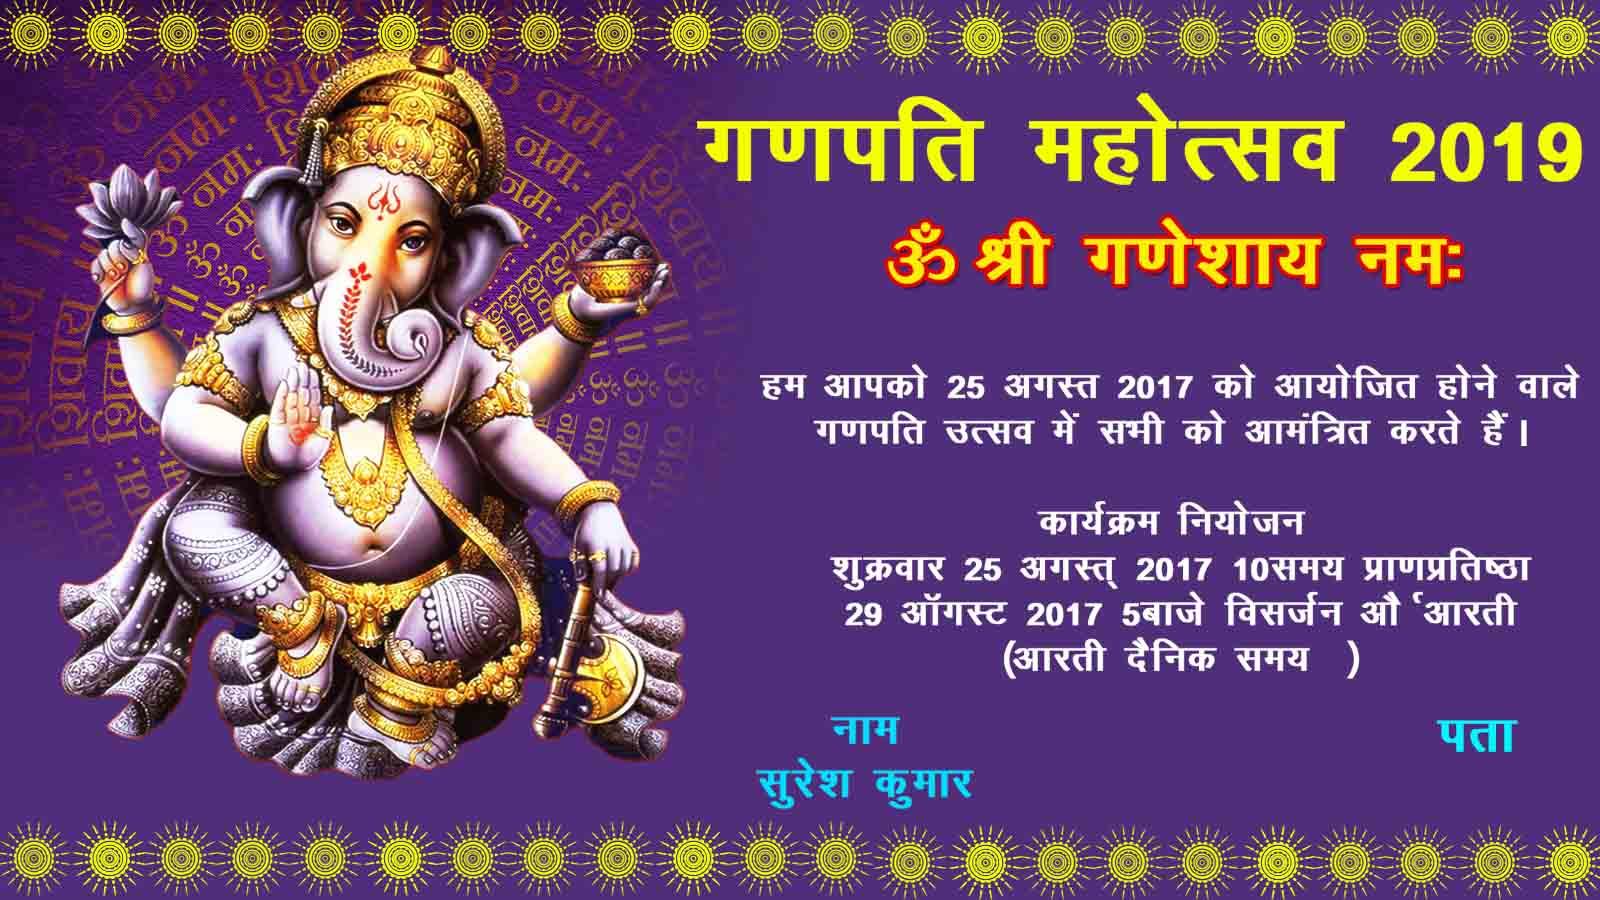 Gaanpati Bappa Invitation Card Picture Density